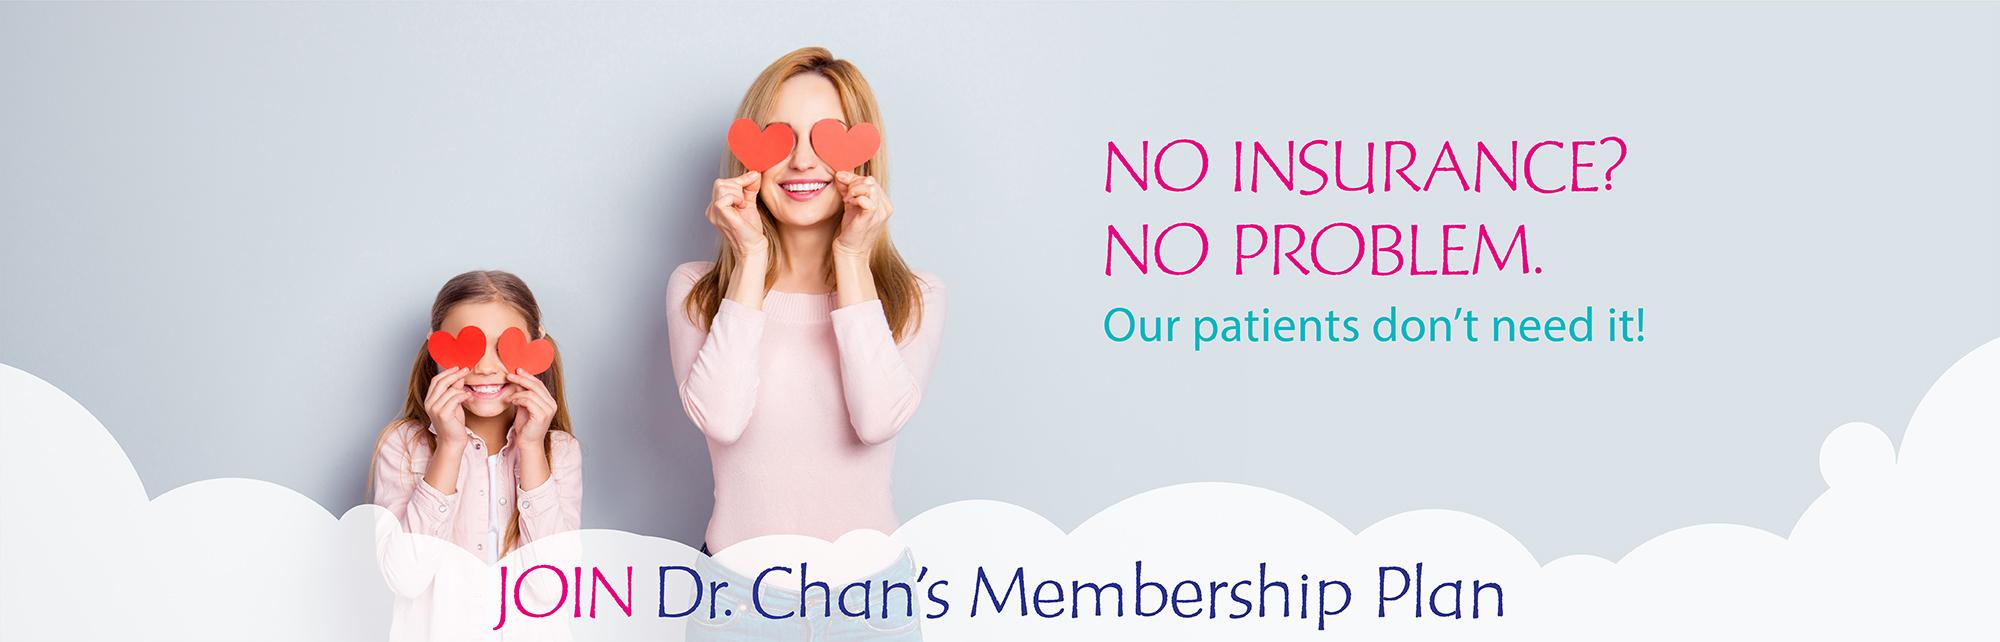 Dr Chan's Membership Plan